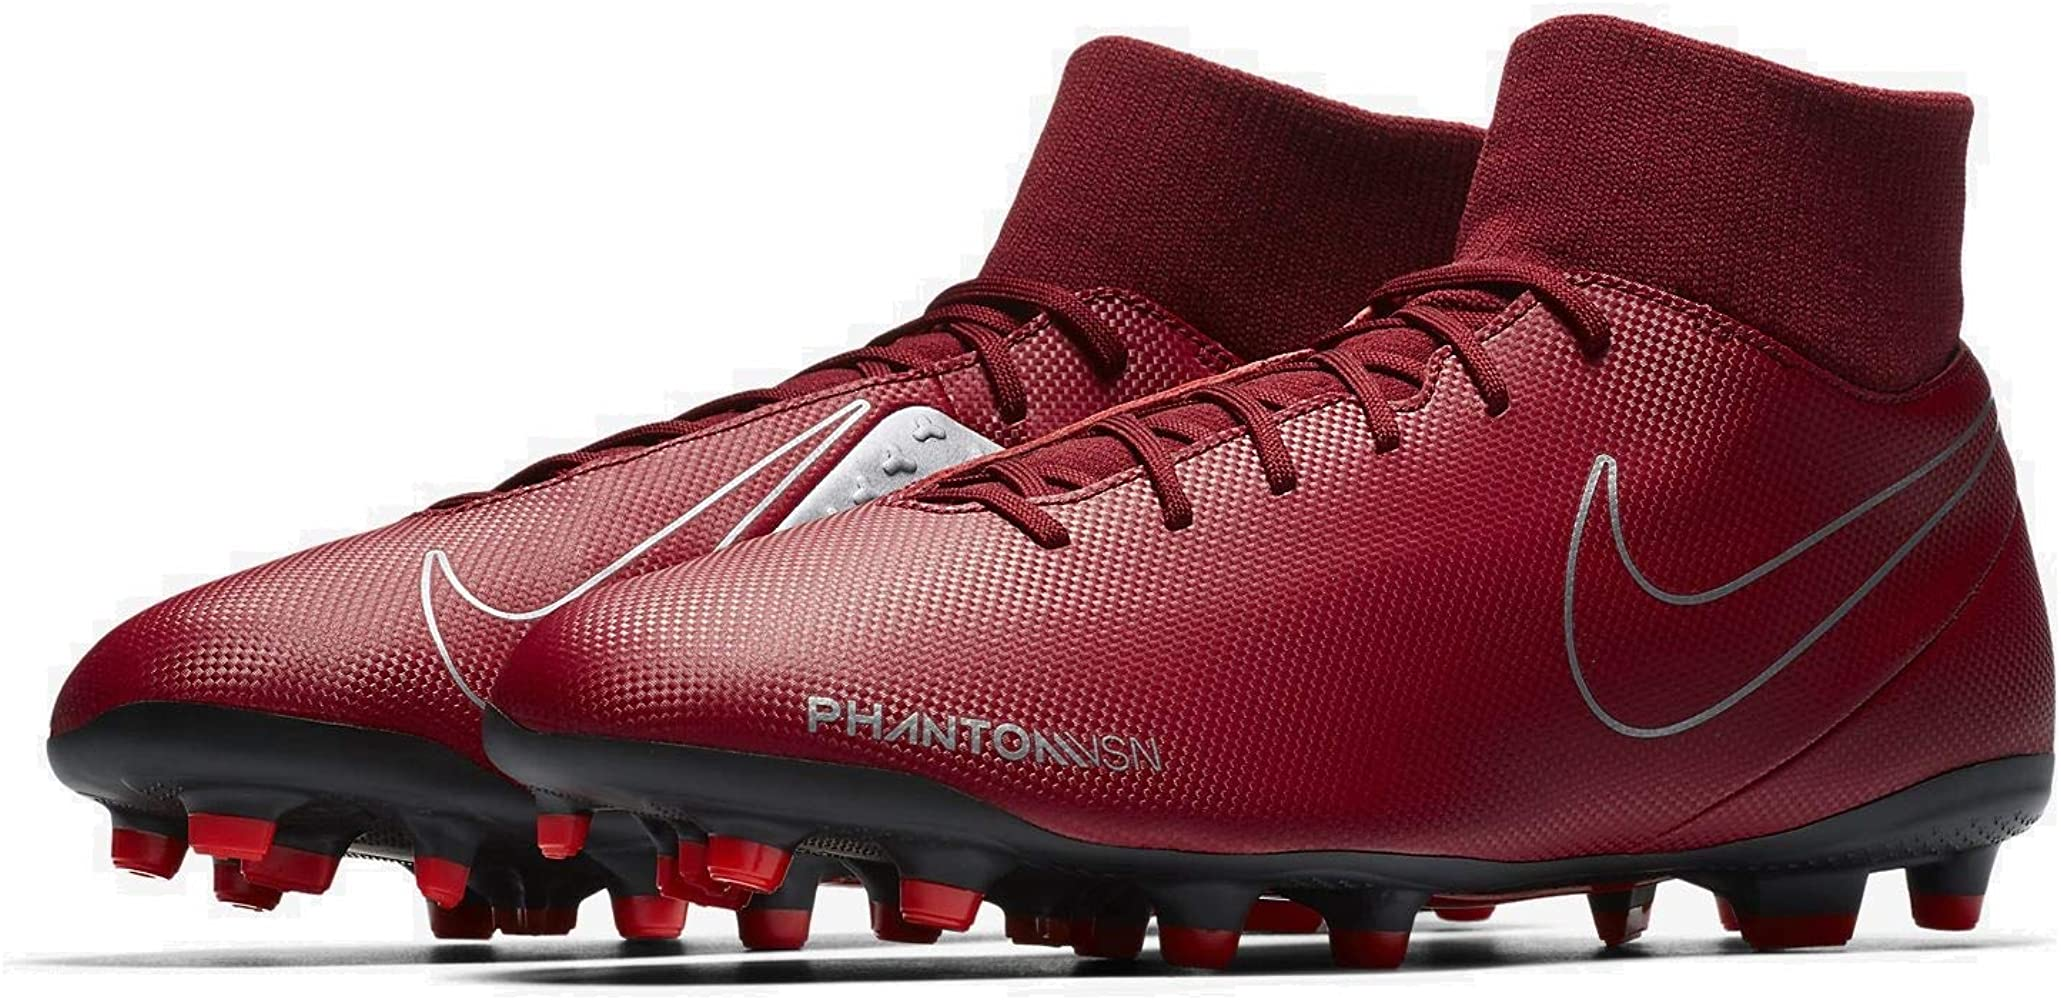 65997a513d225 Hypervenom Phantom Vision Club DF MG Soccer Cleat (Team Red) (Men's  7.5/Women's 9)